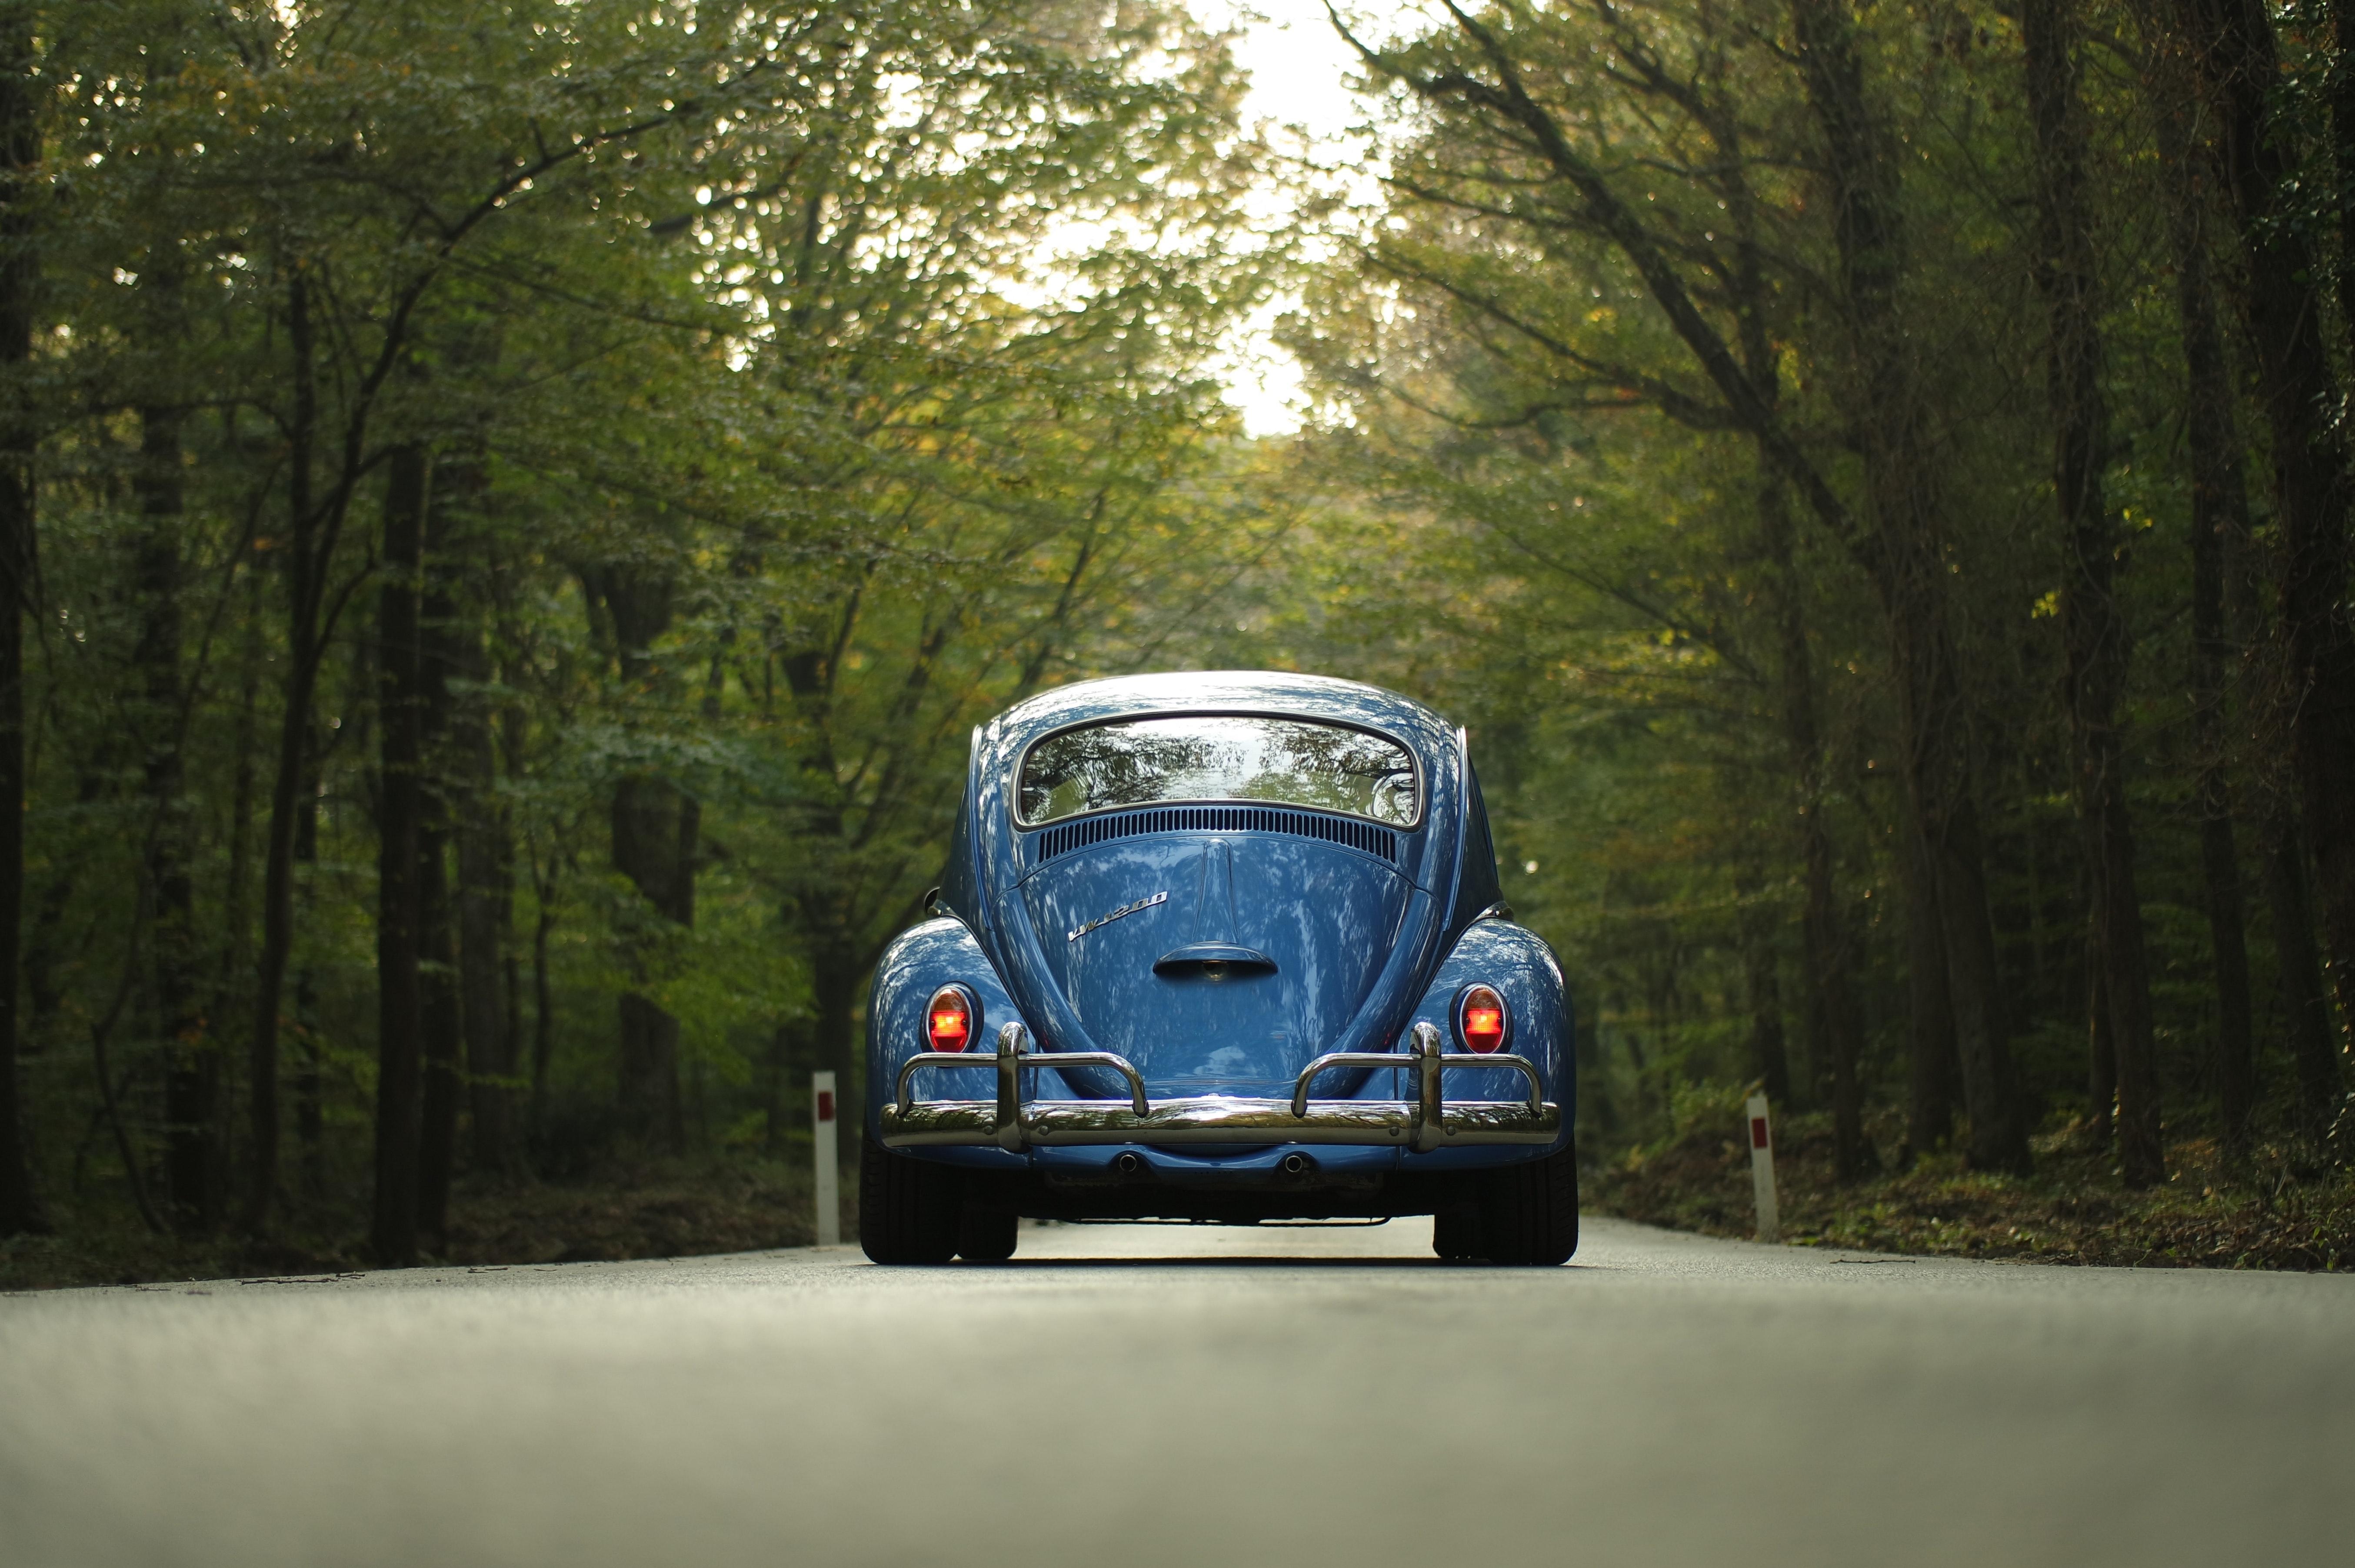 Blue beetle car on gray asphalt road between green leaf trees photo